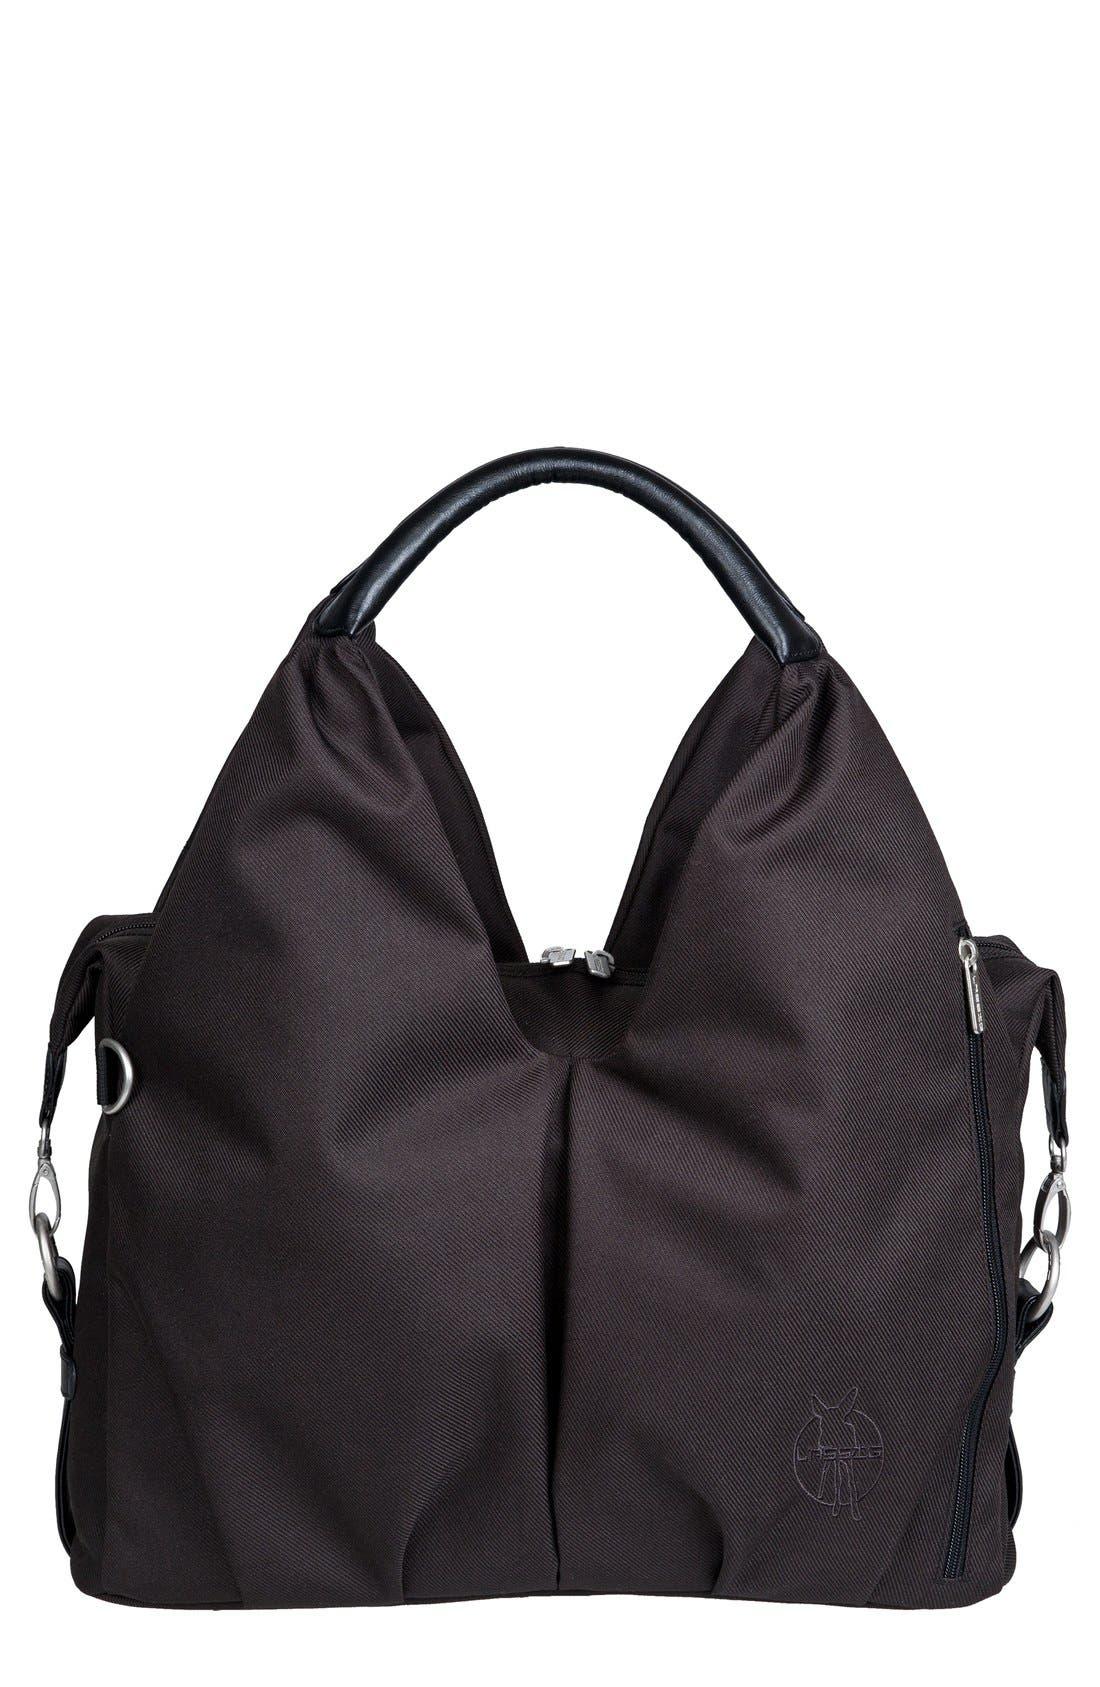 'Green Label - Neckline' Diaper Bag,                         Main,                         color, Black